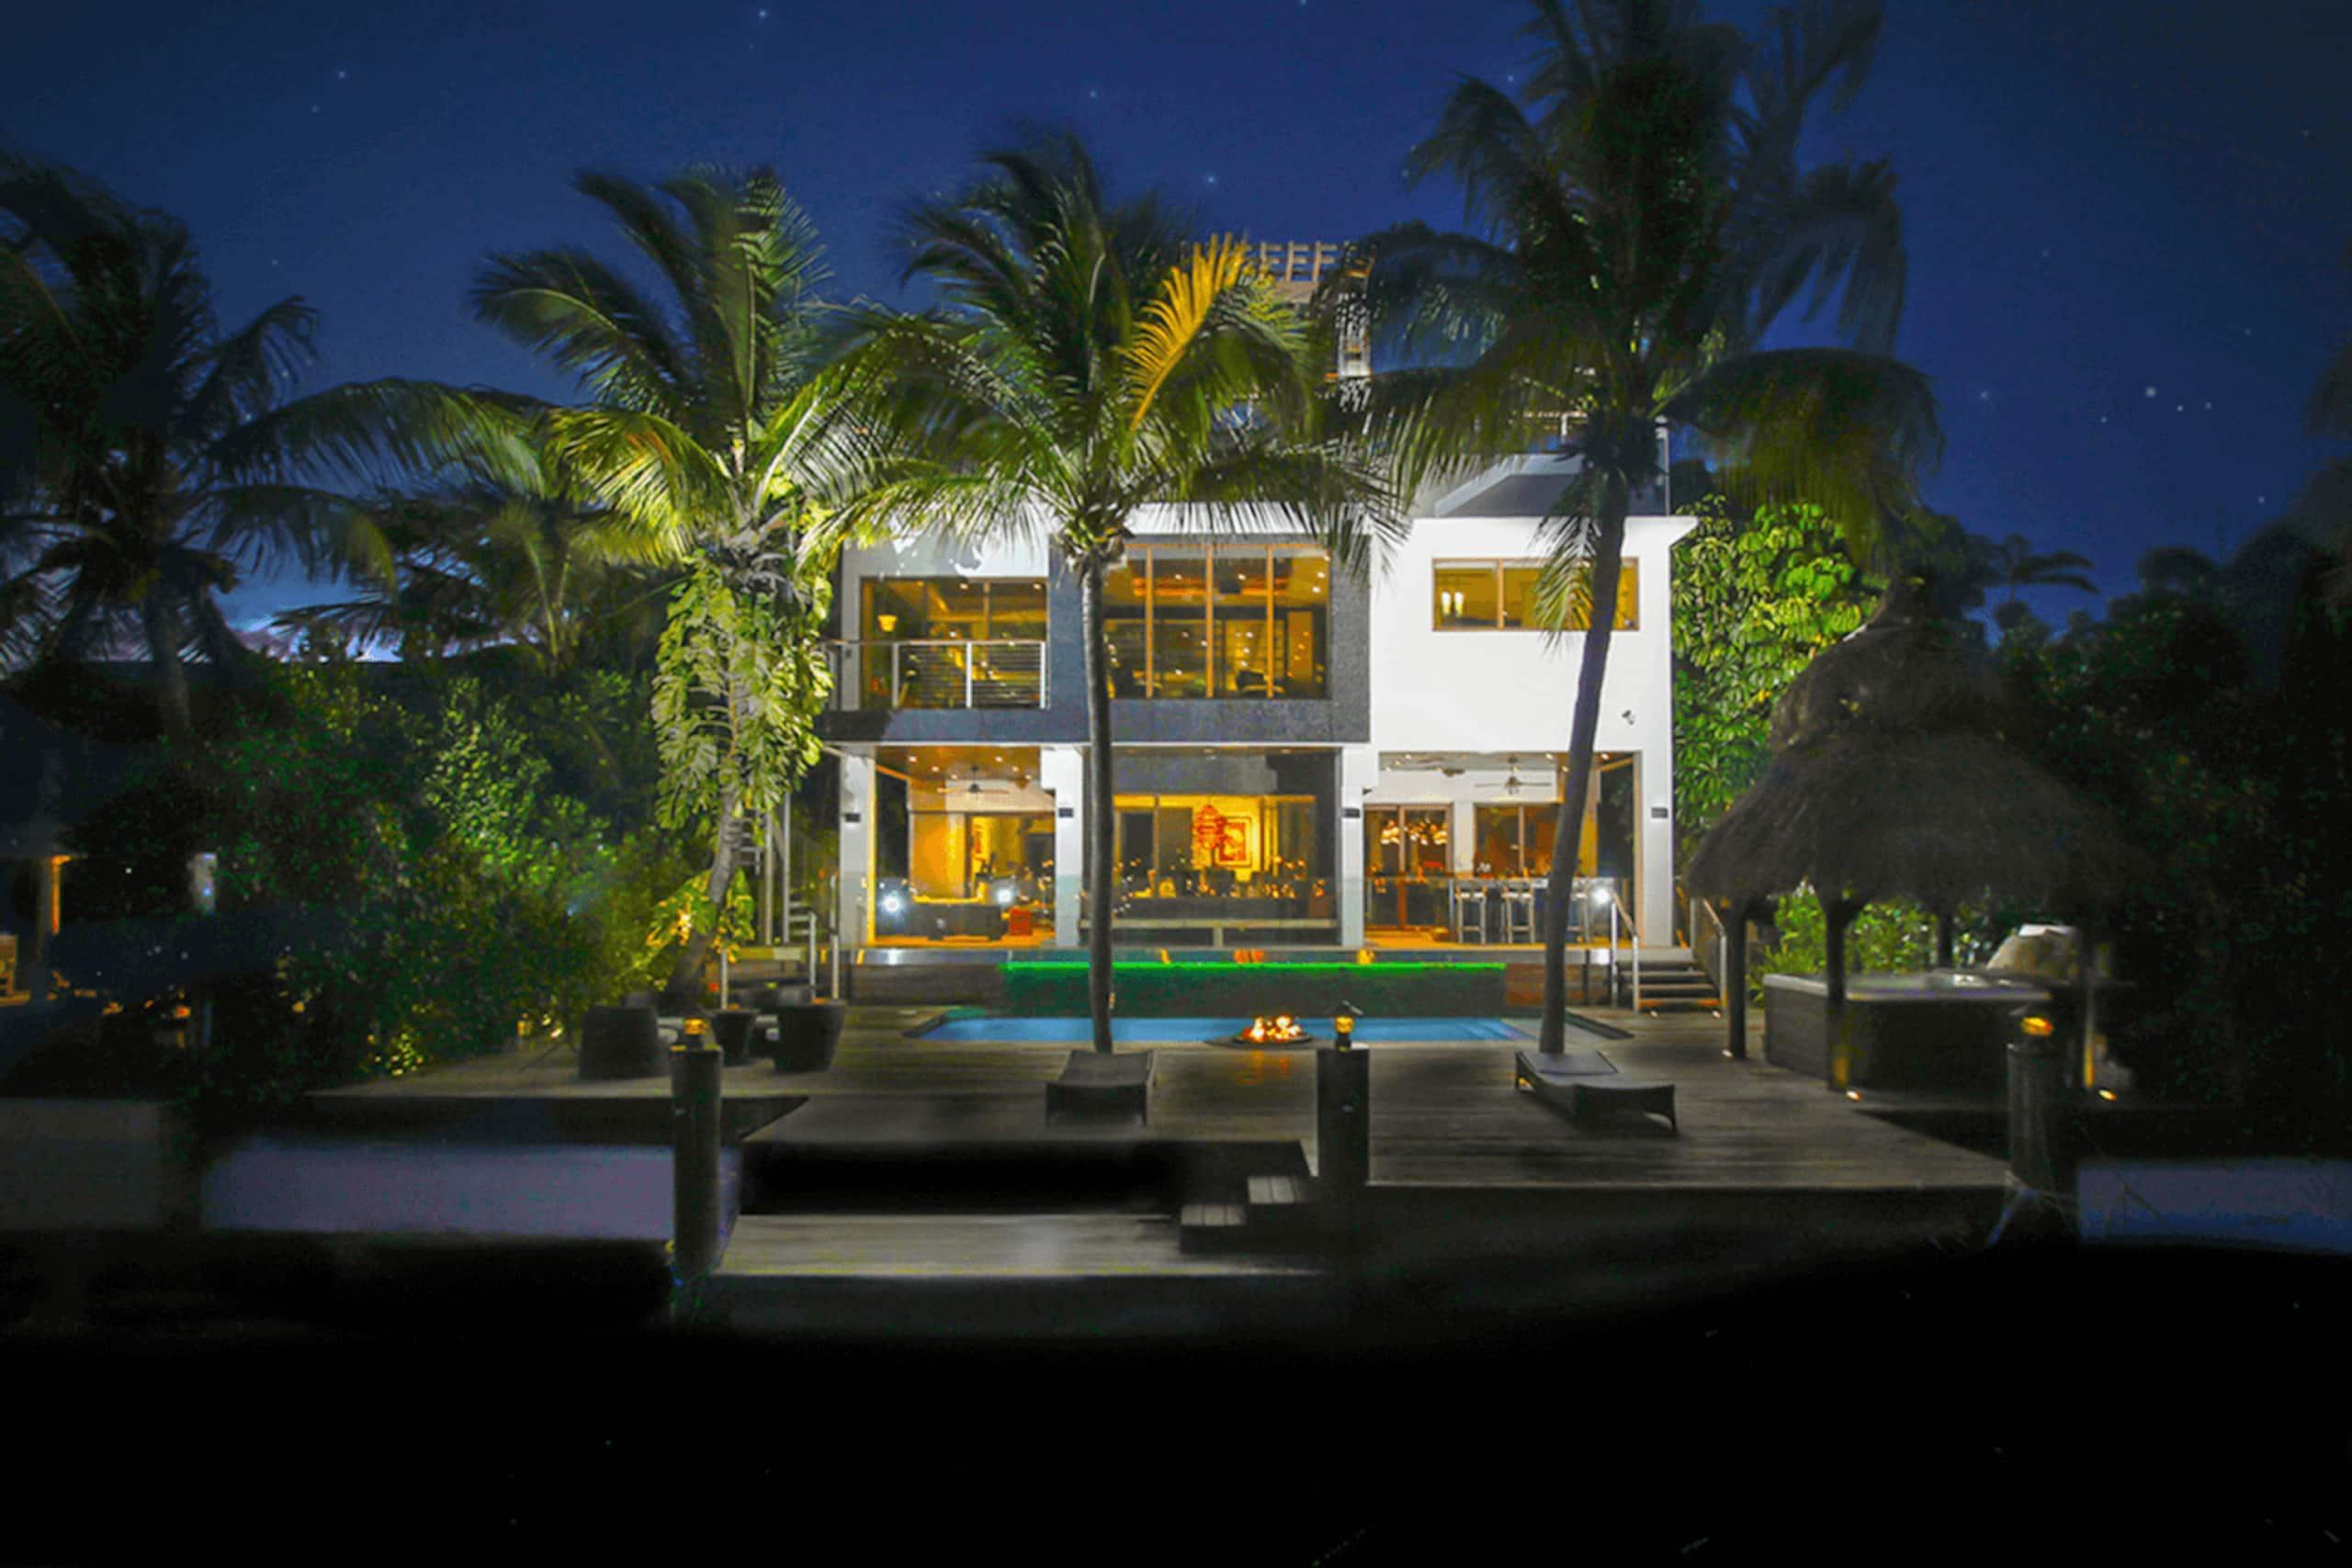 Apartment Villa Riza - Magnificent Balinese-style photo 20185477